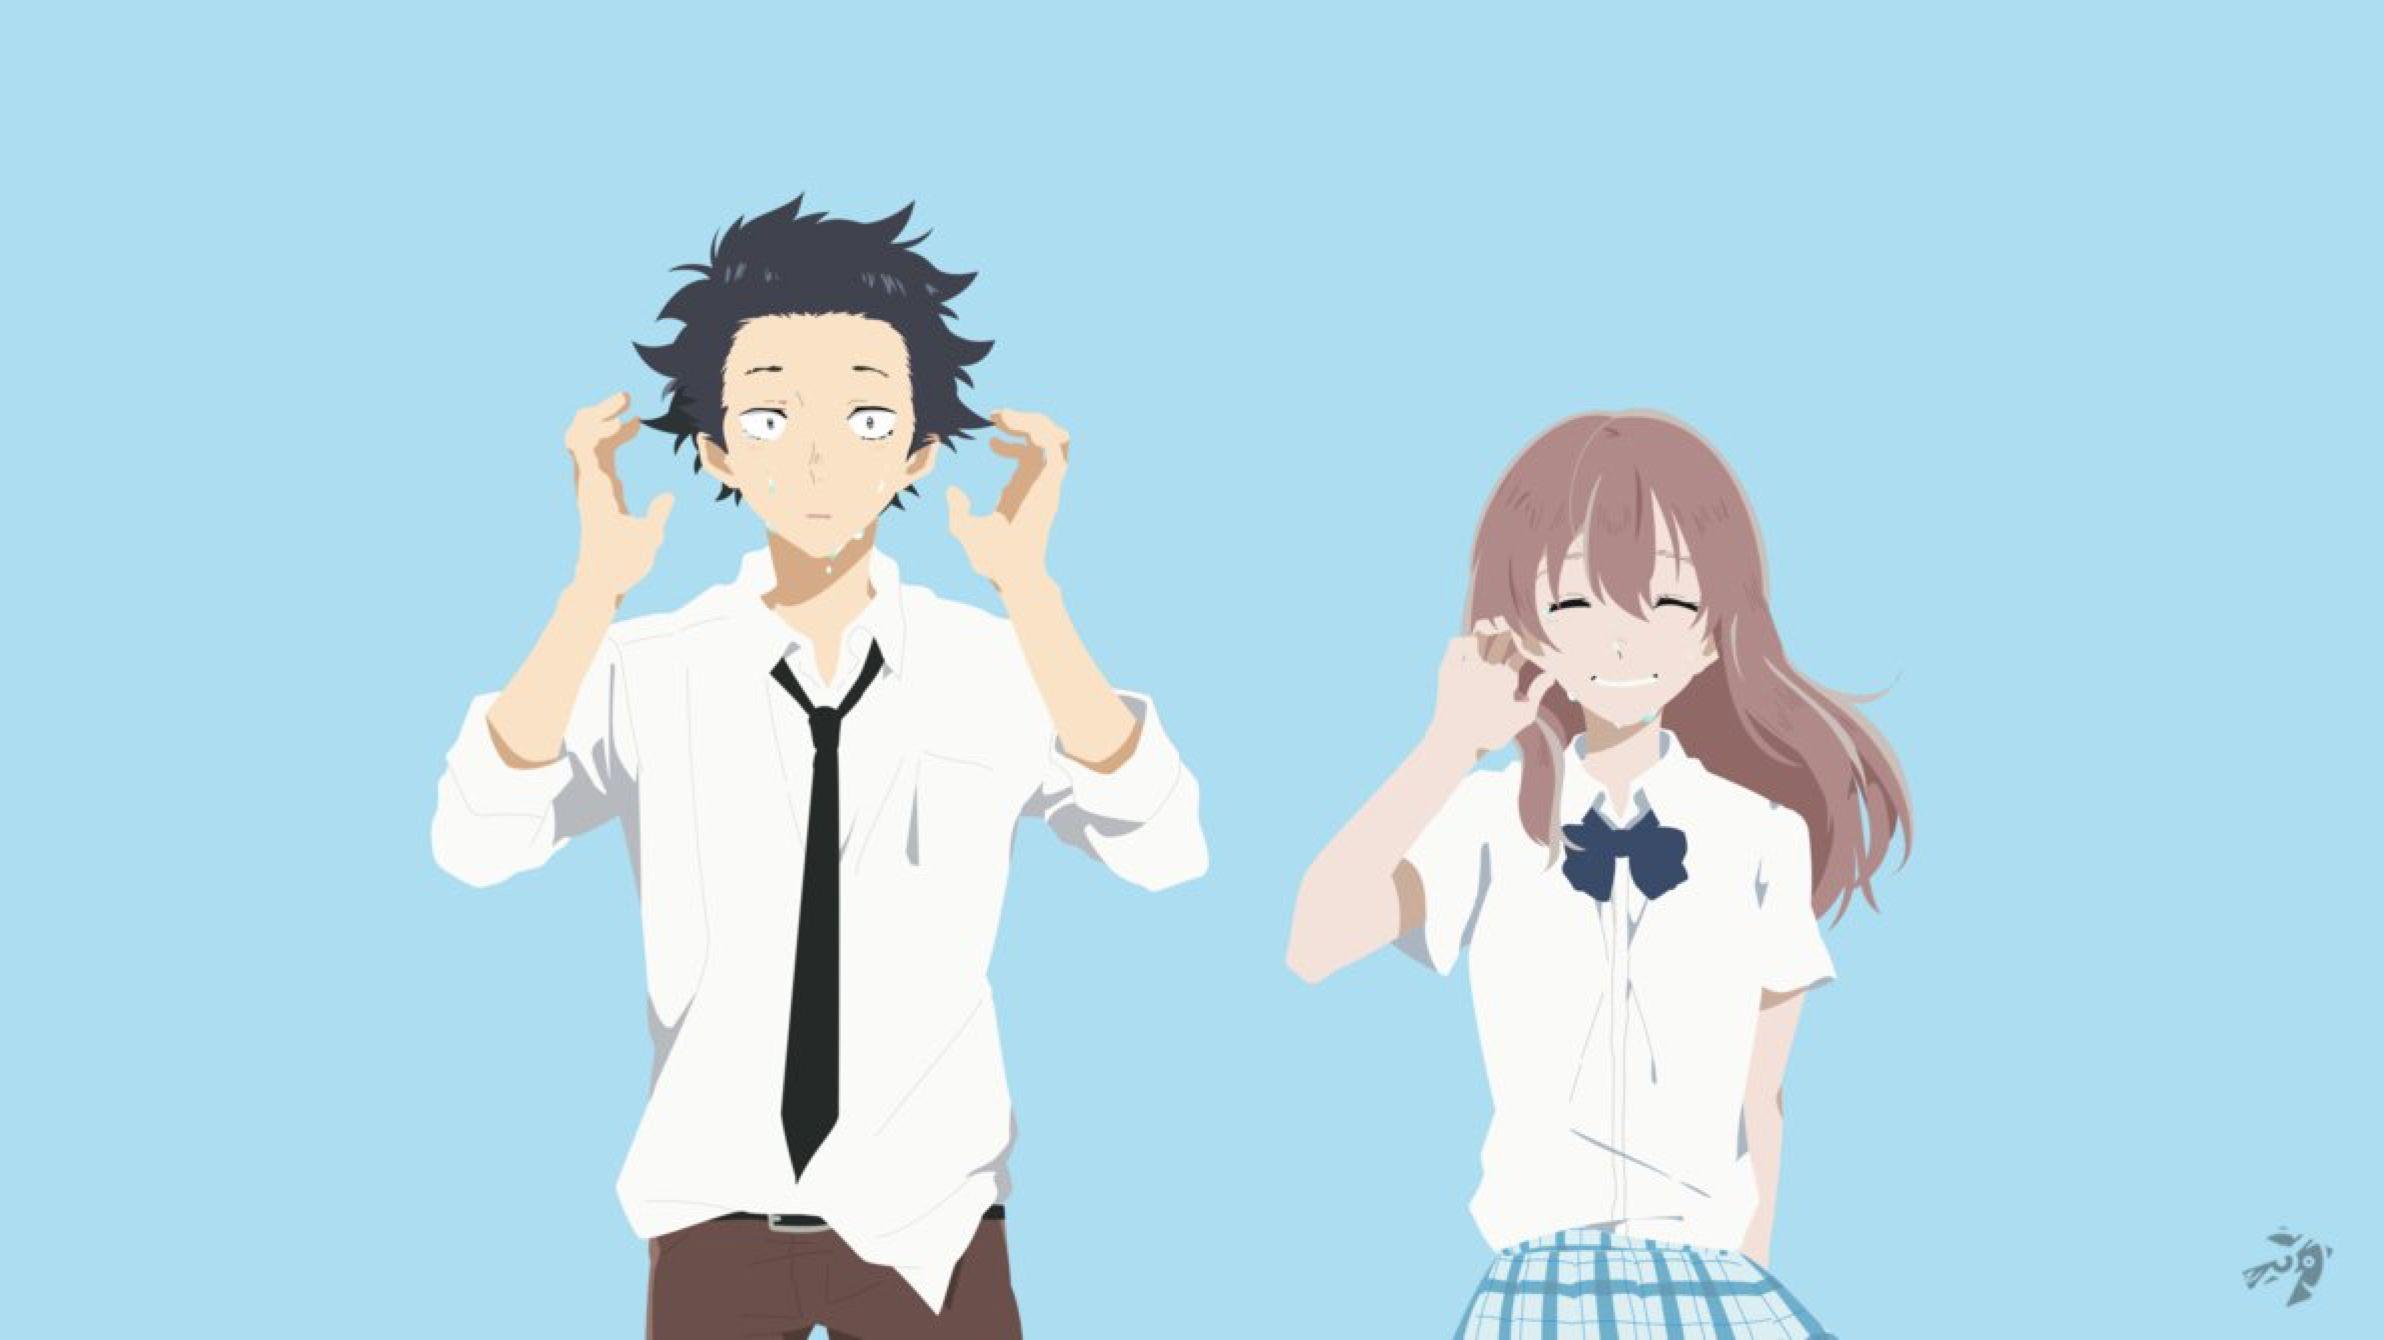 Koe No Katachi Minimalist Anime by Lucifer012 on DeviantArt